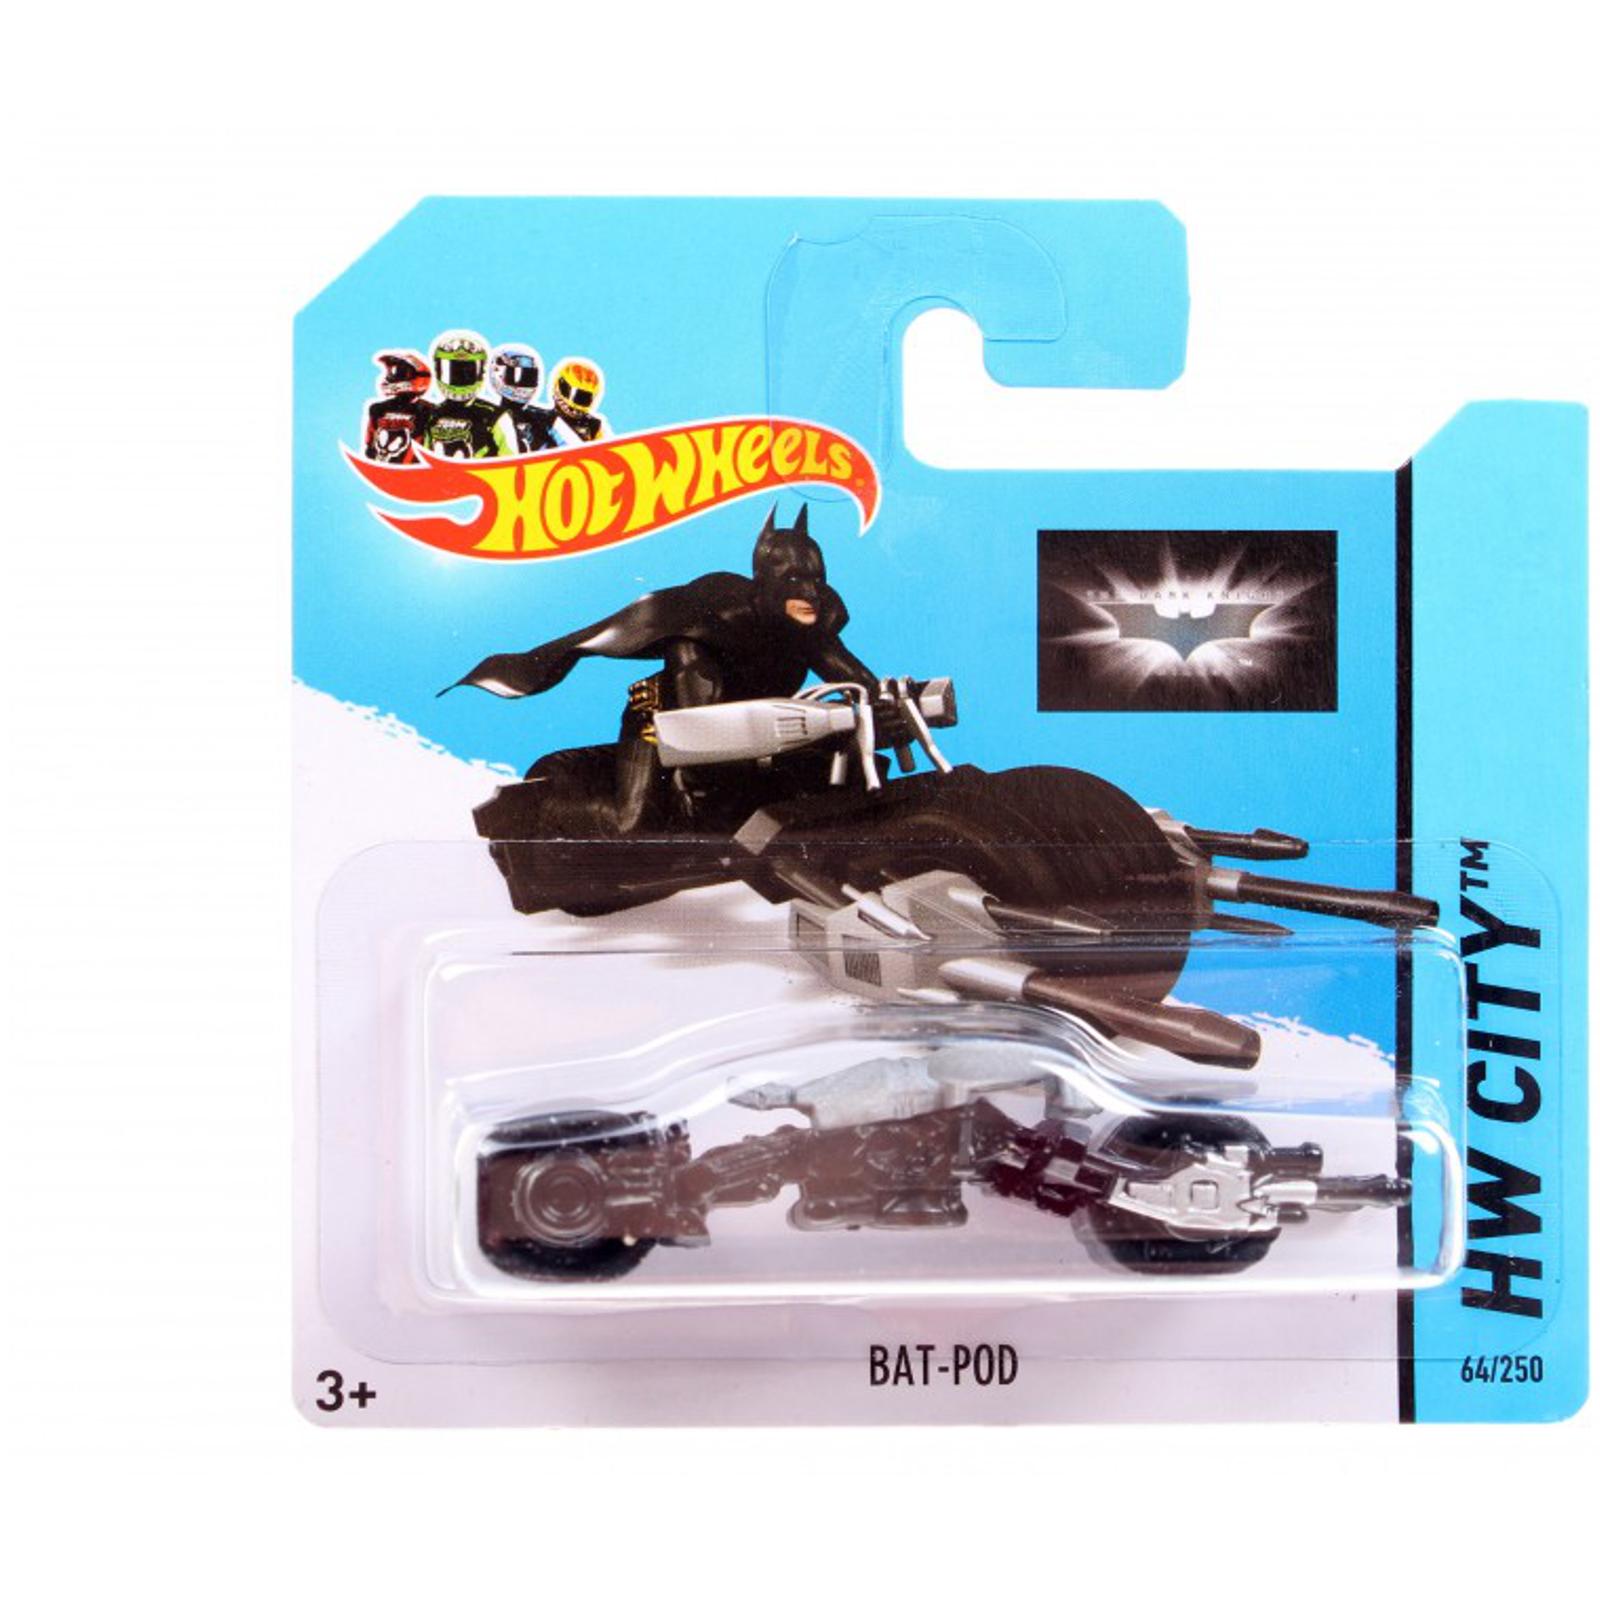 ����������� Hot Wheels ��� ������ Bat-Pod